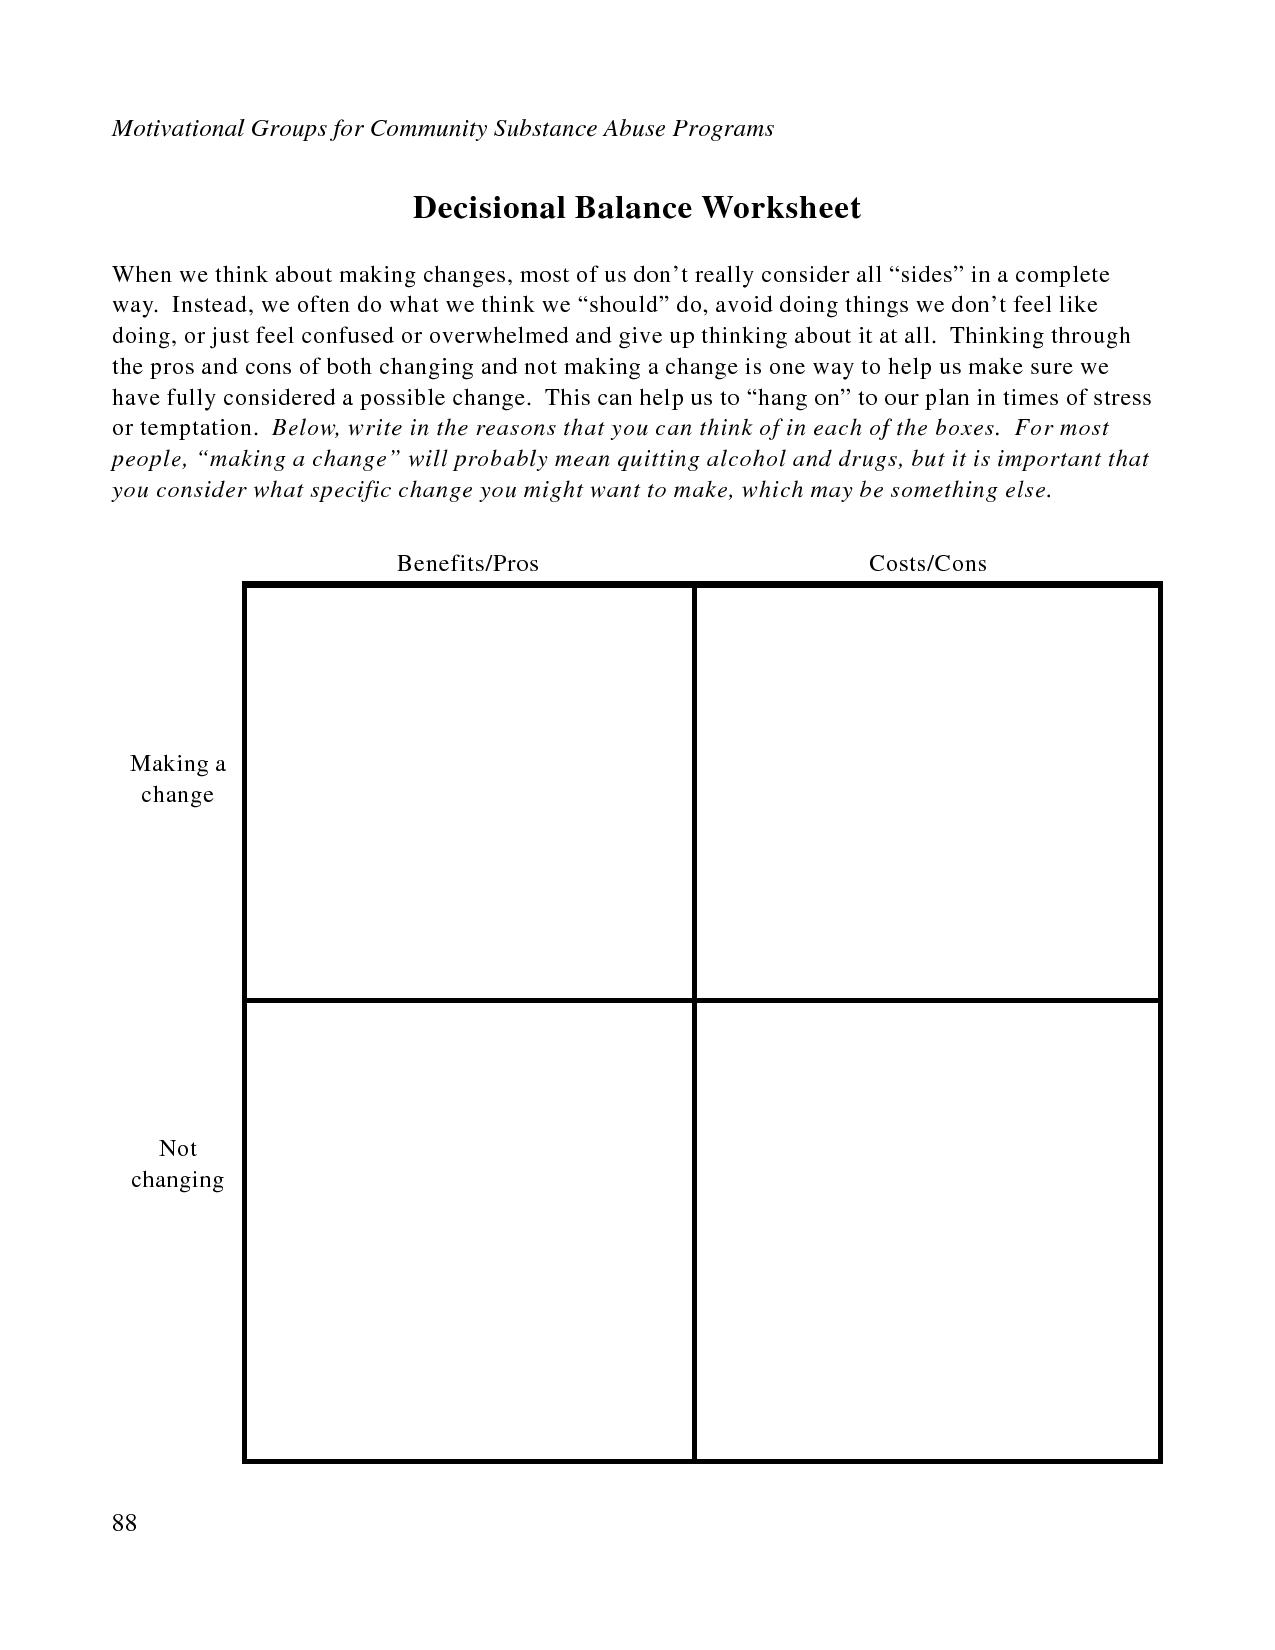 Free Printable Dbt Worksheets   Decisional Balance Worksheet - Pdf - Free Printable Making Change Worksheets